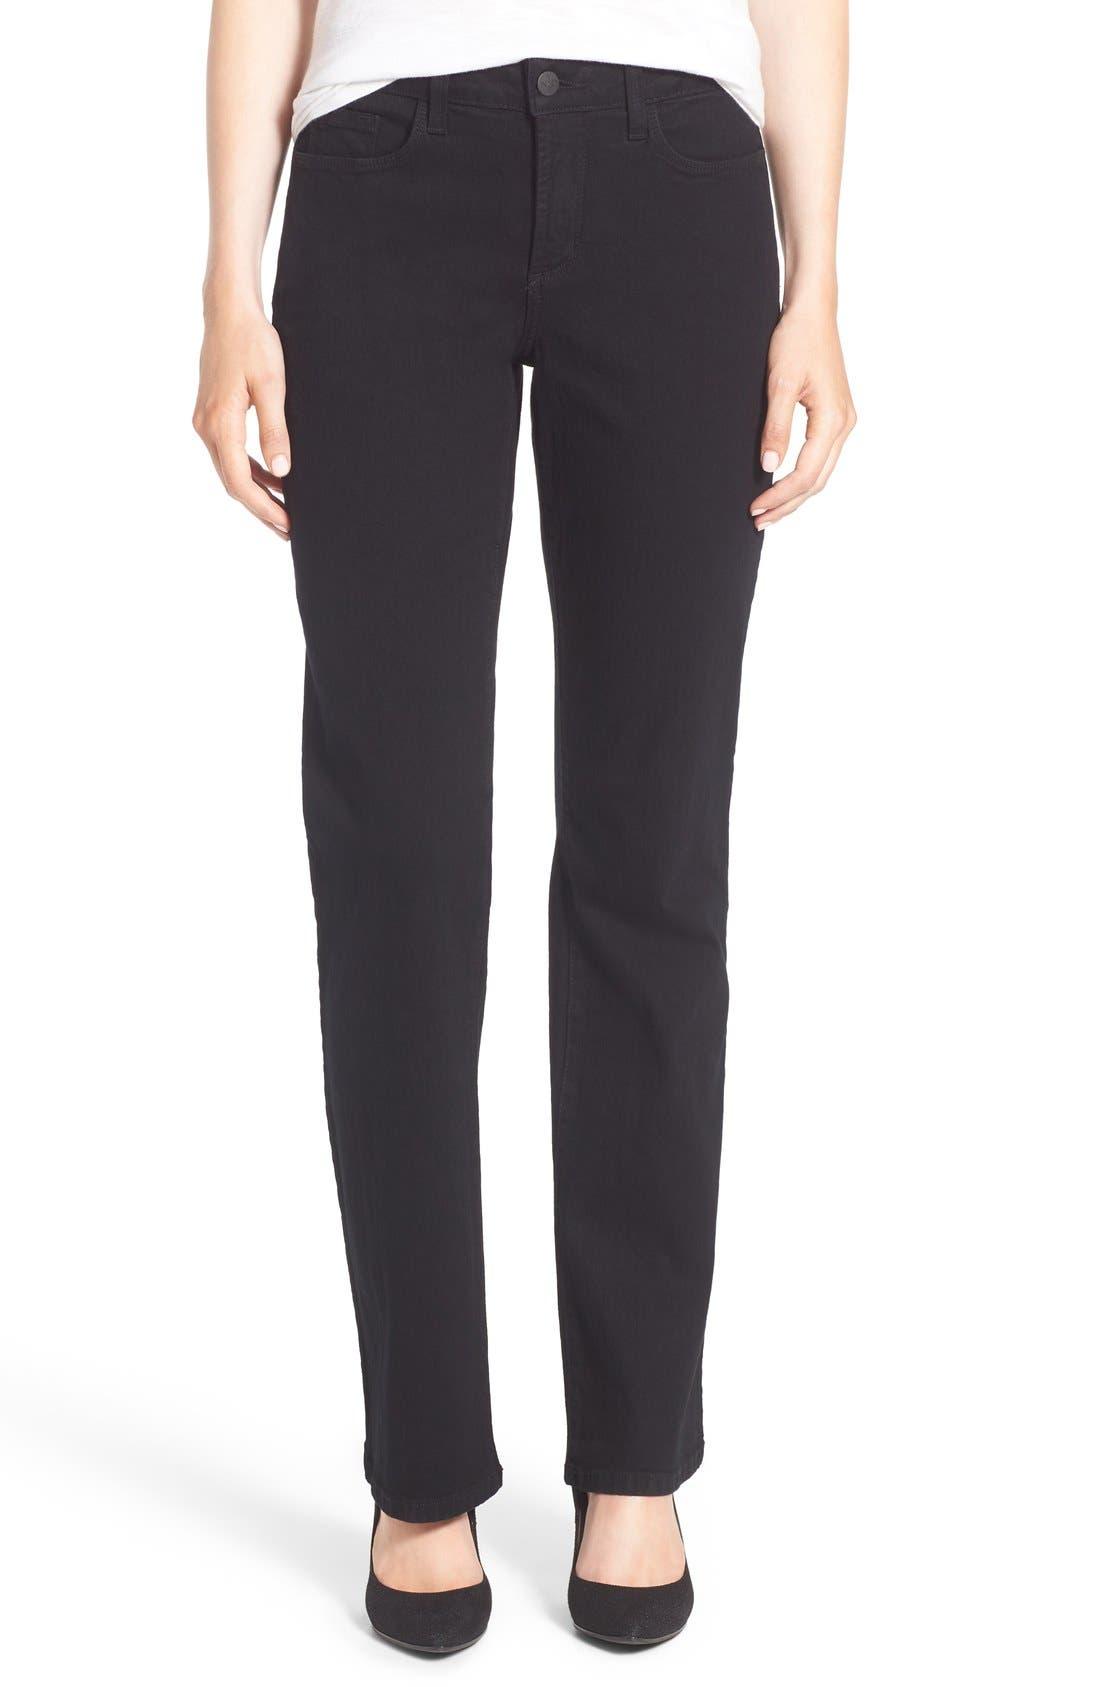 Barbara Stretch Bootcut Jeans,                         Main,                         color, Black